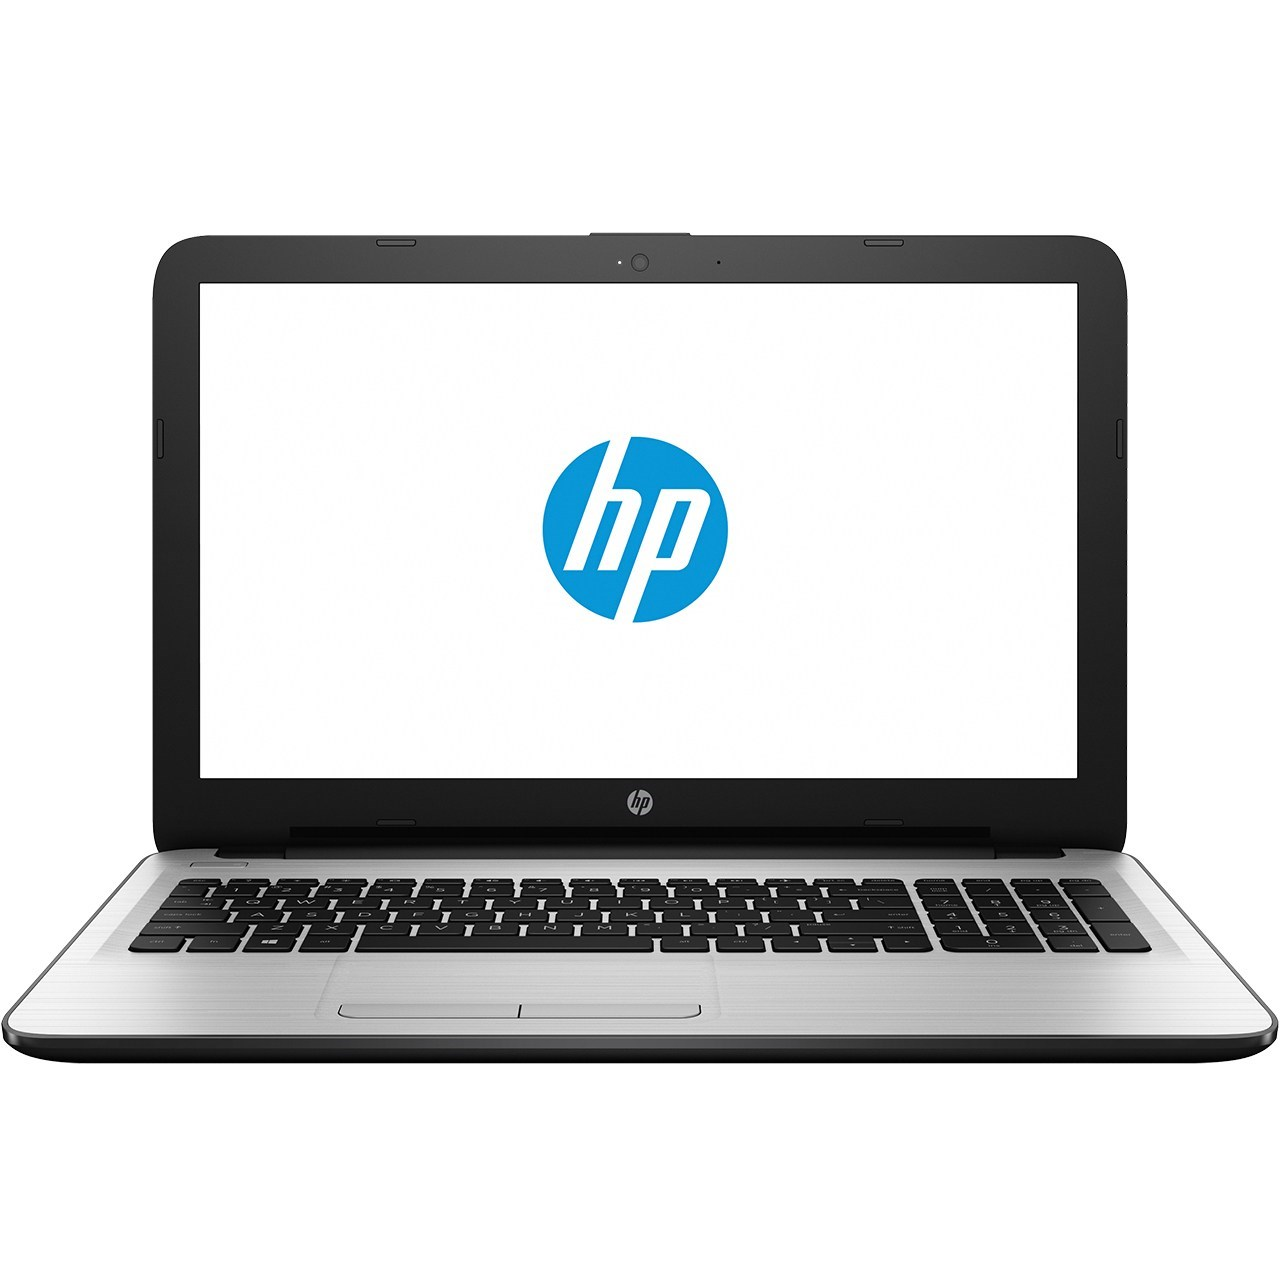 لپ تاپ 15 اینچی اچ پی مدل 15-ay113ne